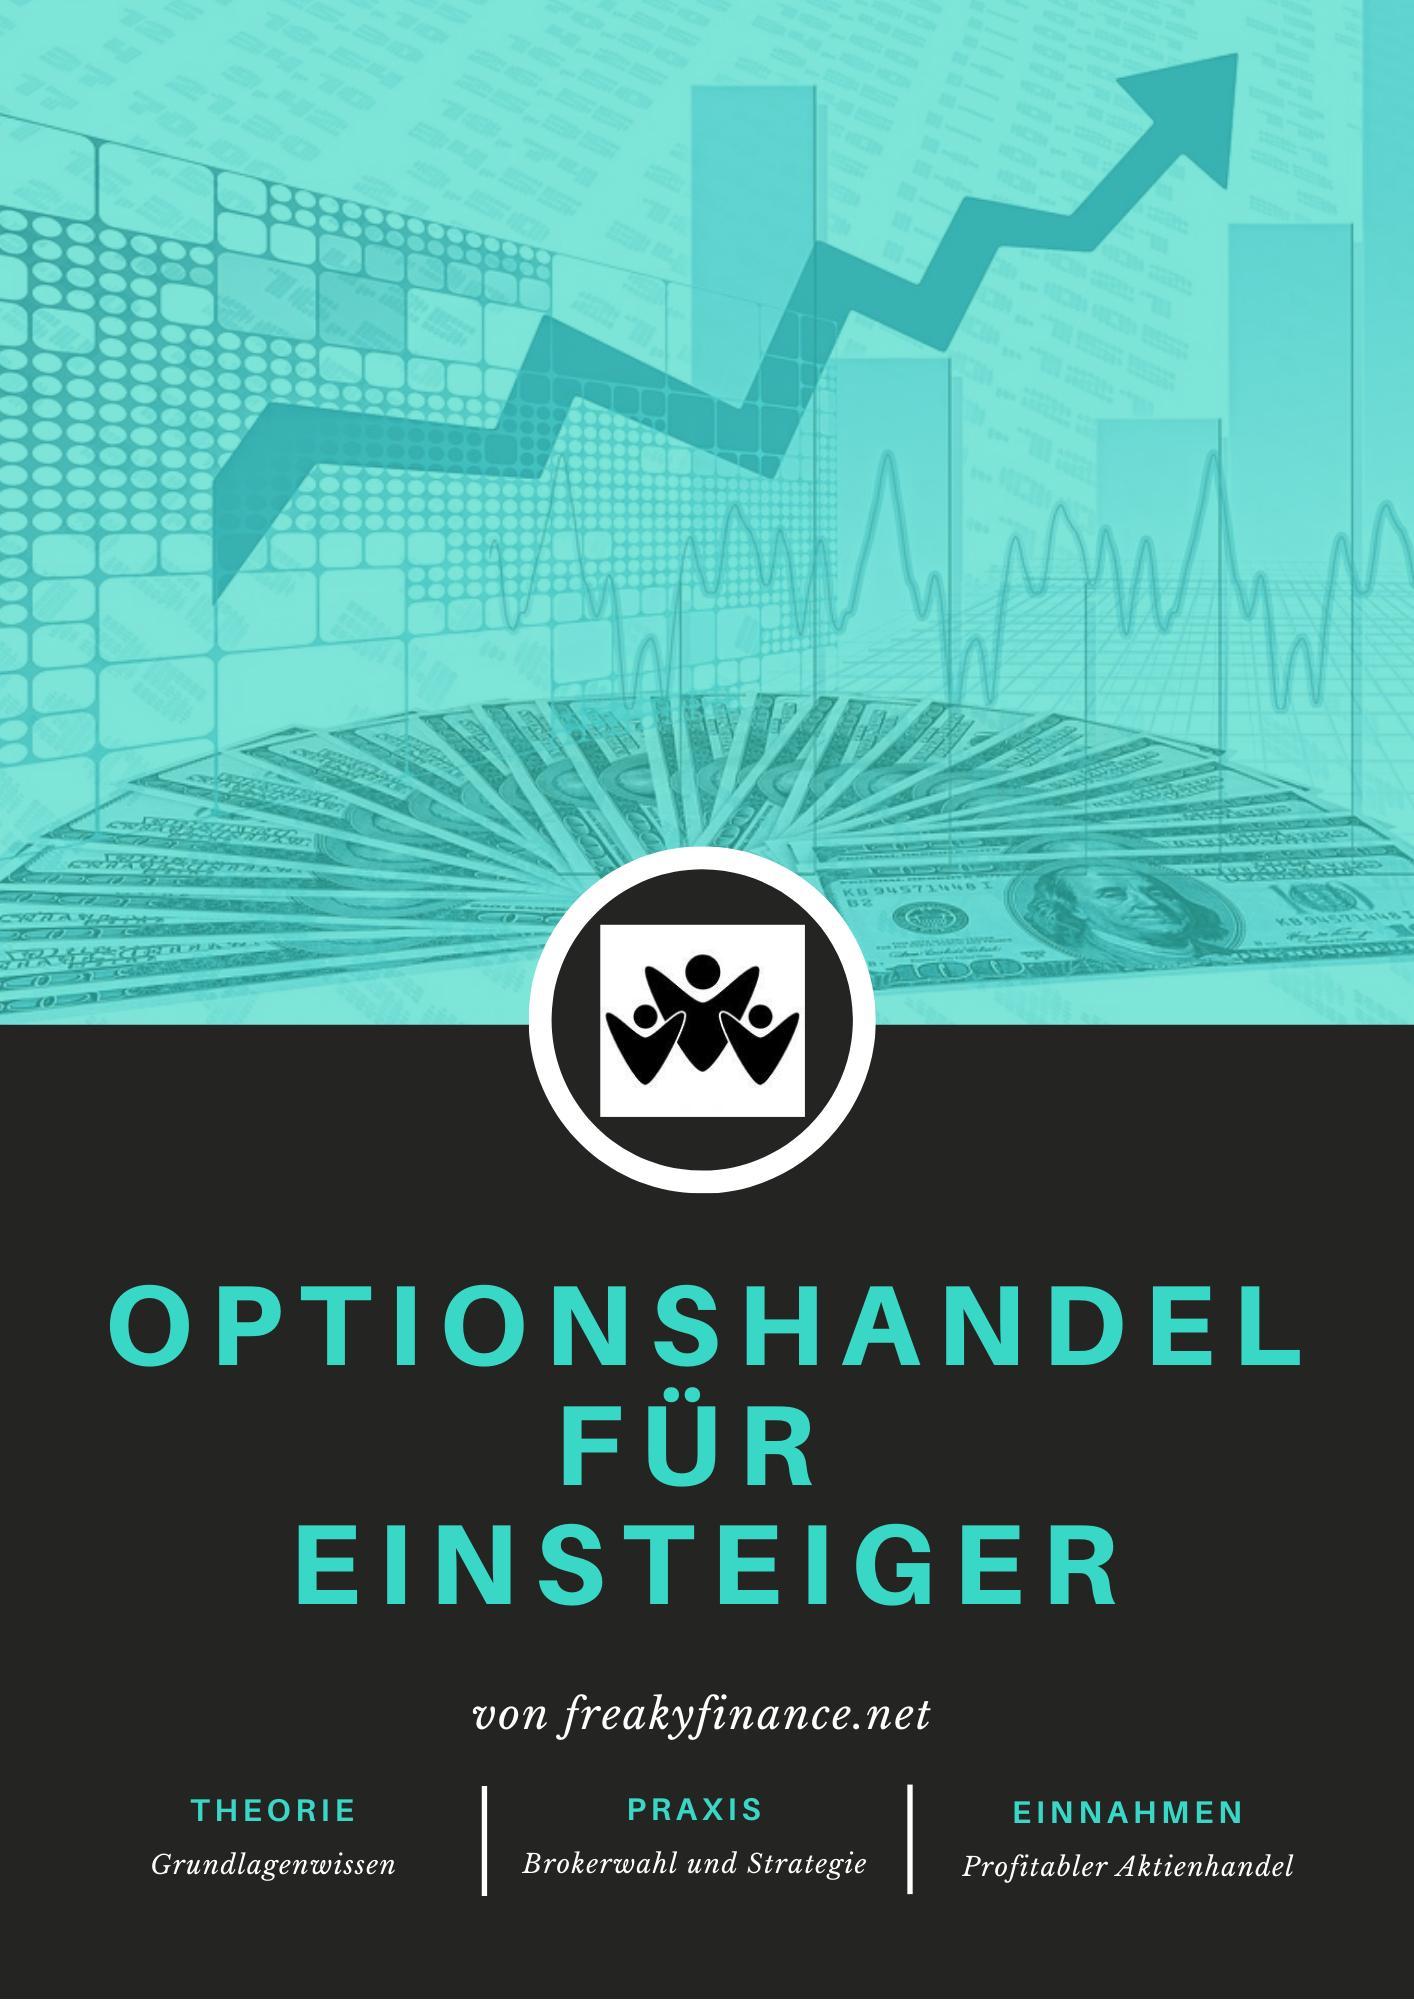 optionshandel unregulierte binäre optionen broker Österreich